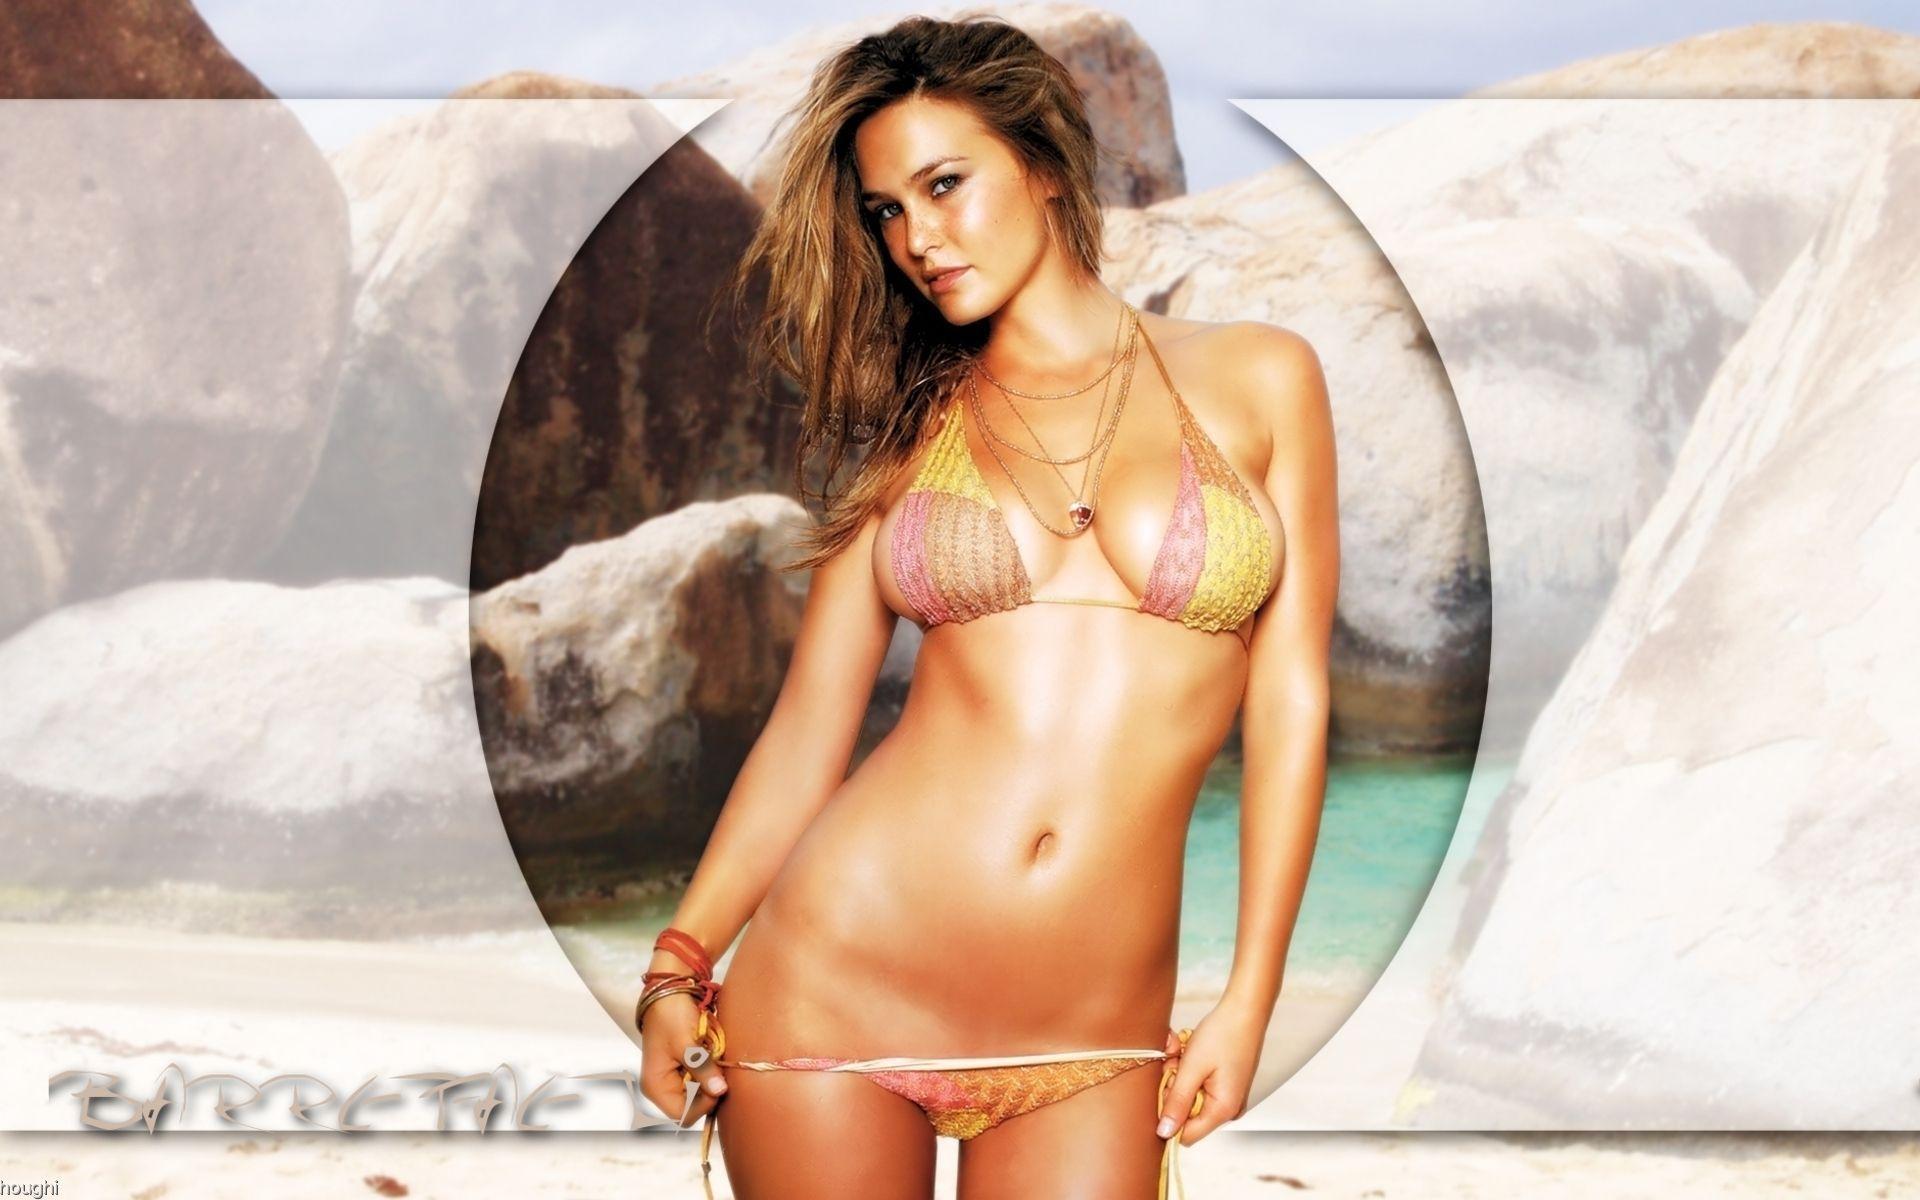 Bar refaeli hot in bikini full hd desktop wallpapers 1080p - Hd bikini wallpapers for pc ...